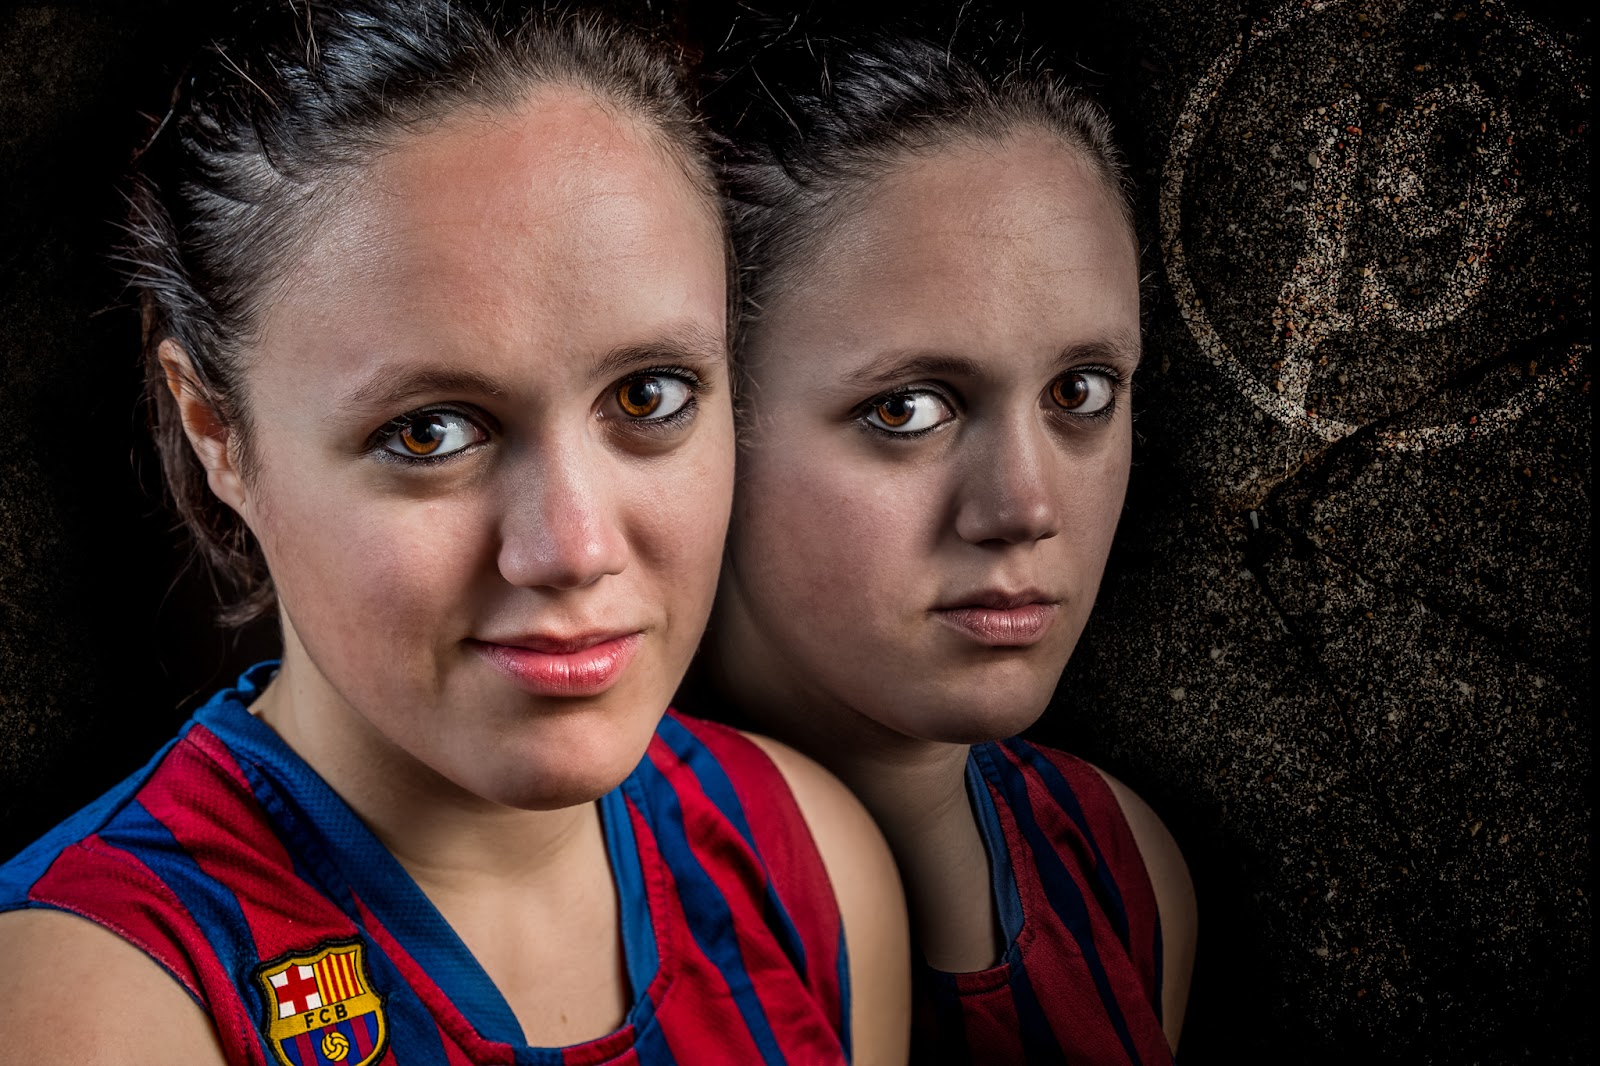 Ari 19 - CBS Barça Senior Femenino A - 2013 :: 2 x Canon EOS 5D MkIII | ISO100 | Canon 24-105 @50&58mm | f/11 | 1/60s